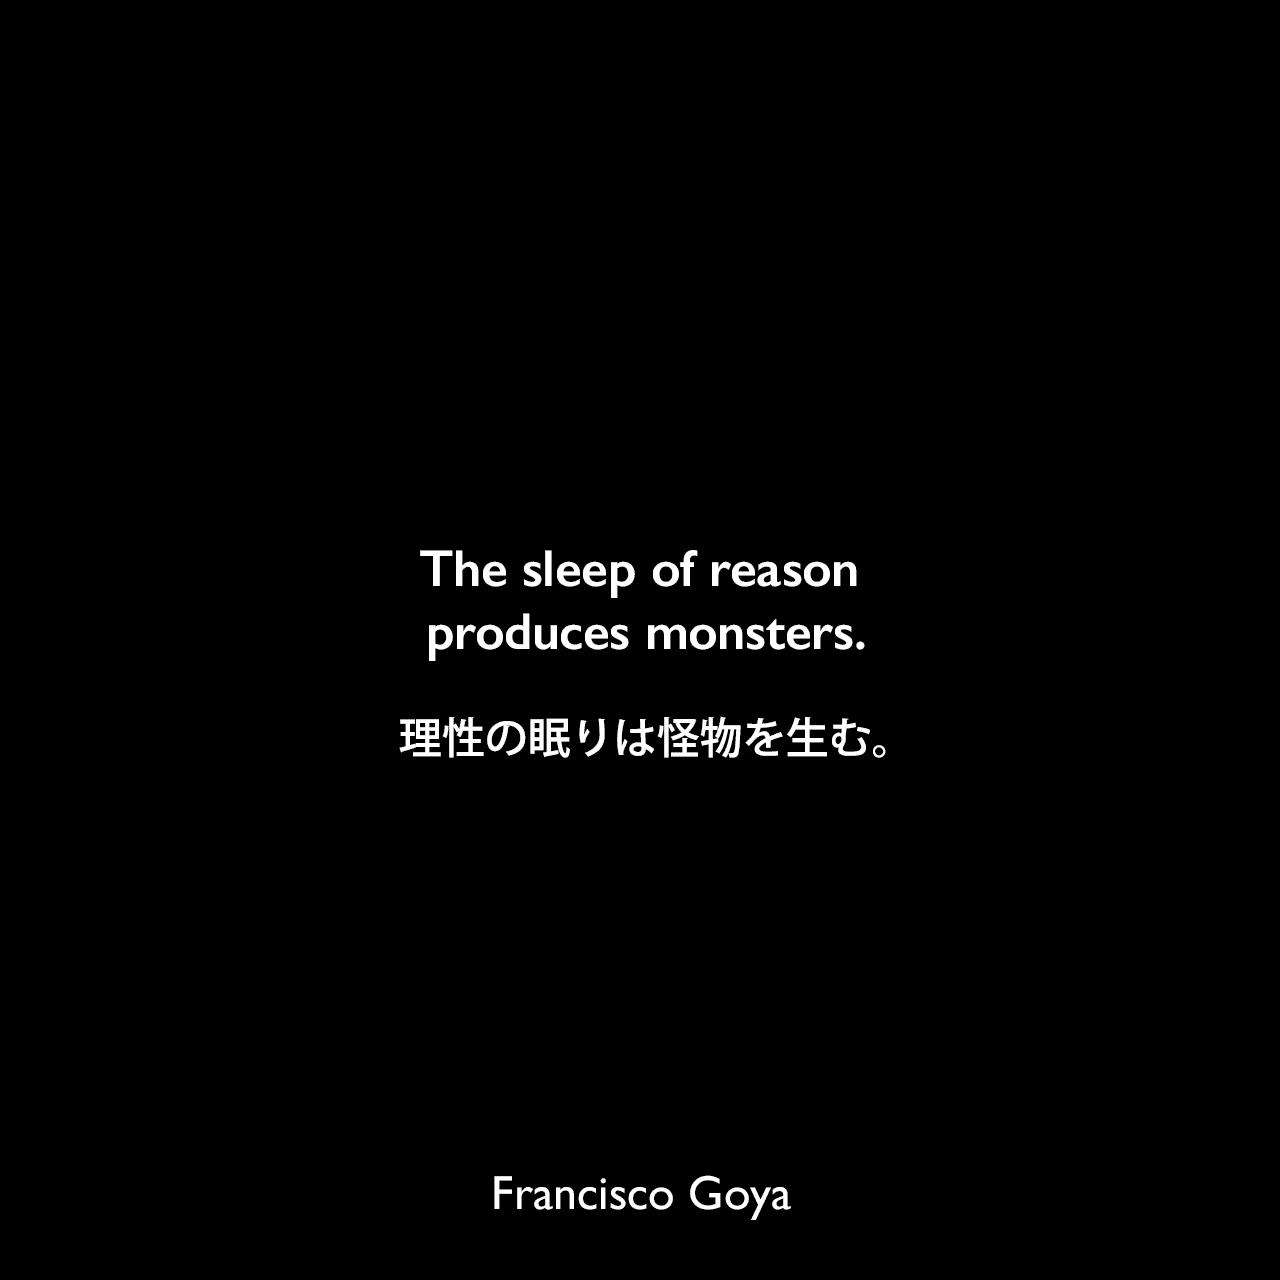 The sleep of reason produces monsters.理性の眠りは怪物を生む。- ゴヤの版画作品セット「ロス・カプリチョス」の43番目の作品のキャプションよりFrancisco Goya